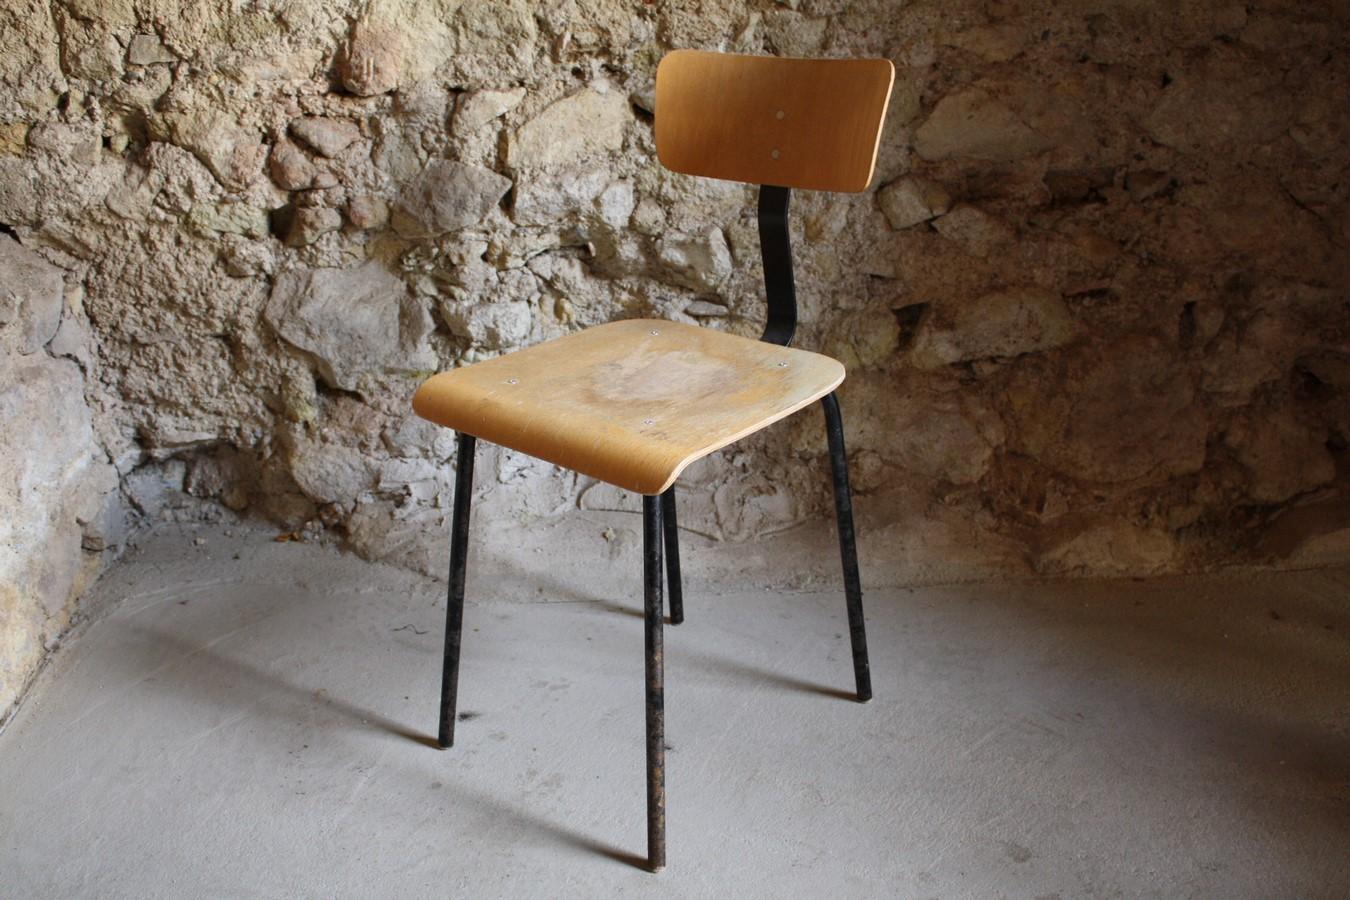 werkstattstuhle-industriestuhle-industrie-design-stuhle-gebraucht-alt-vintage-loft-14